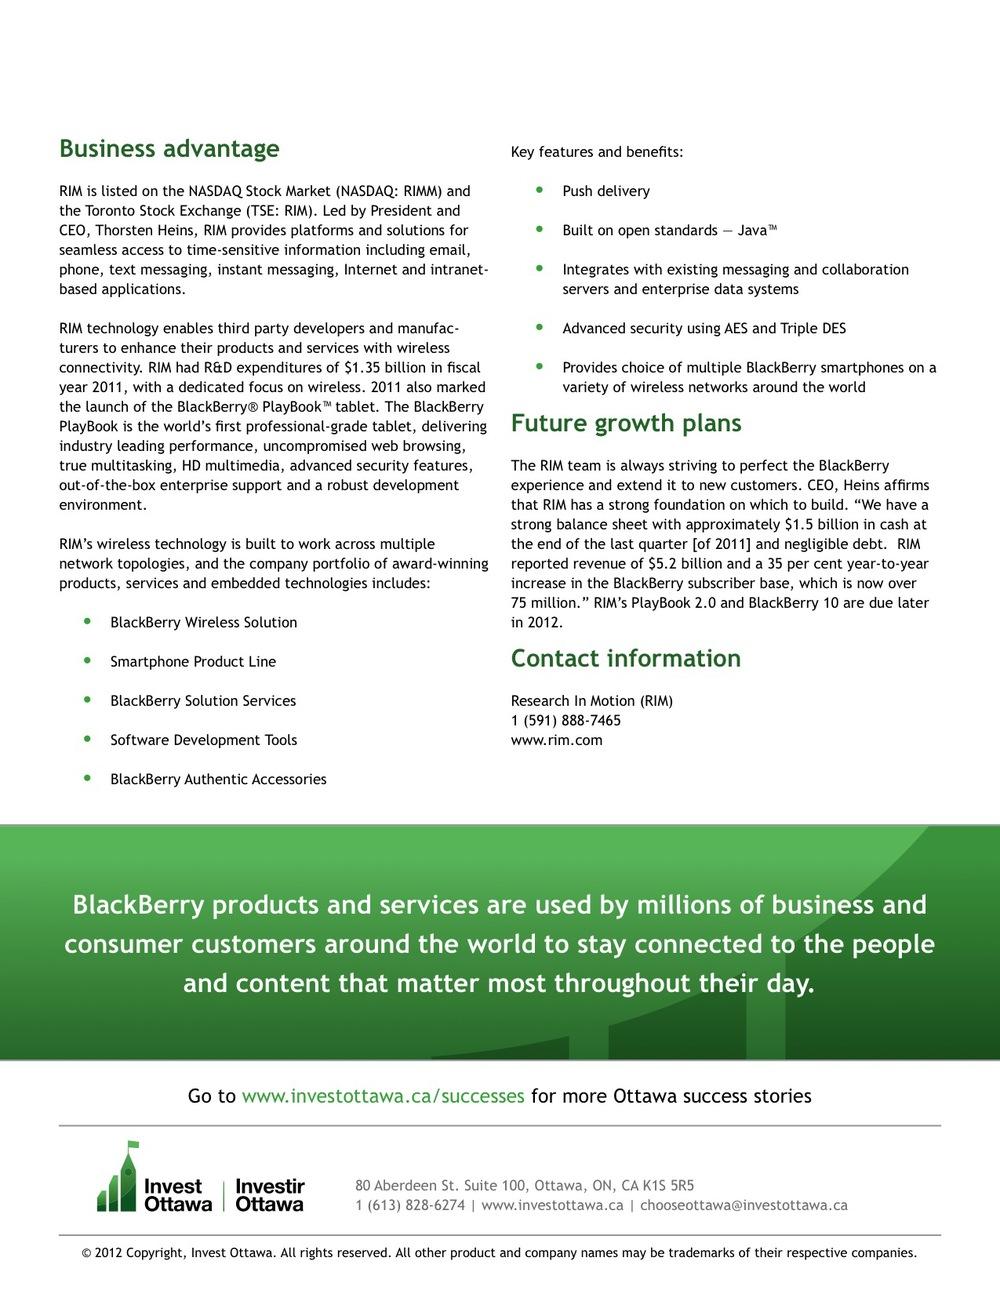 InvestOttawa-RIM-VIEW-page2.jpg